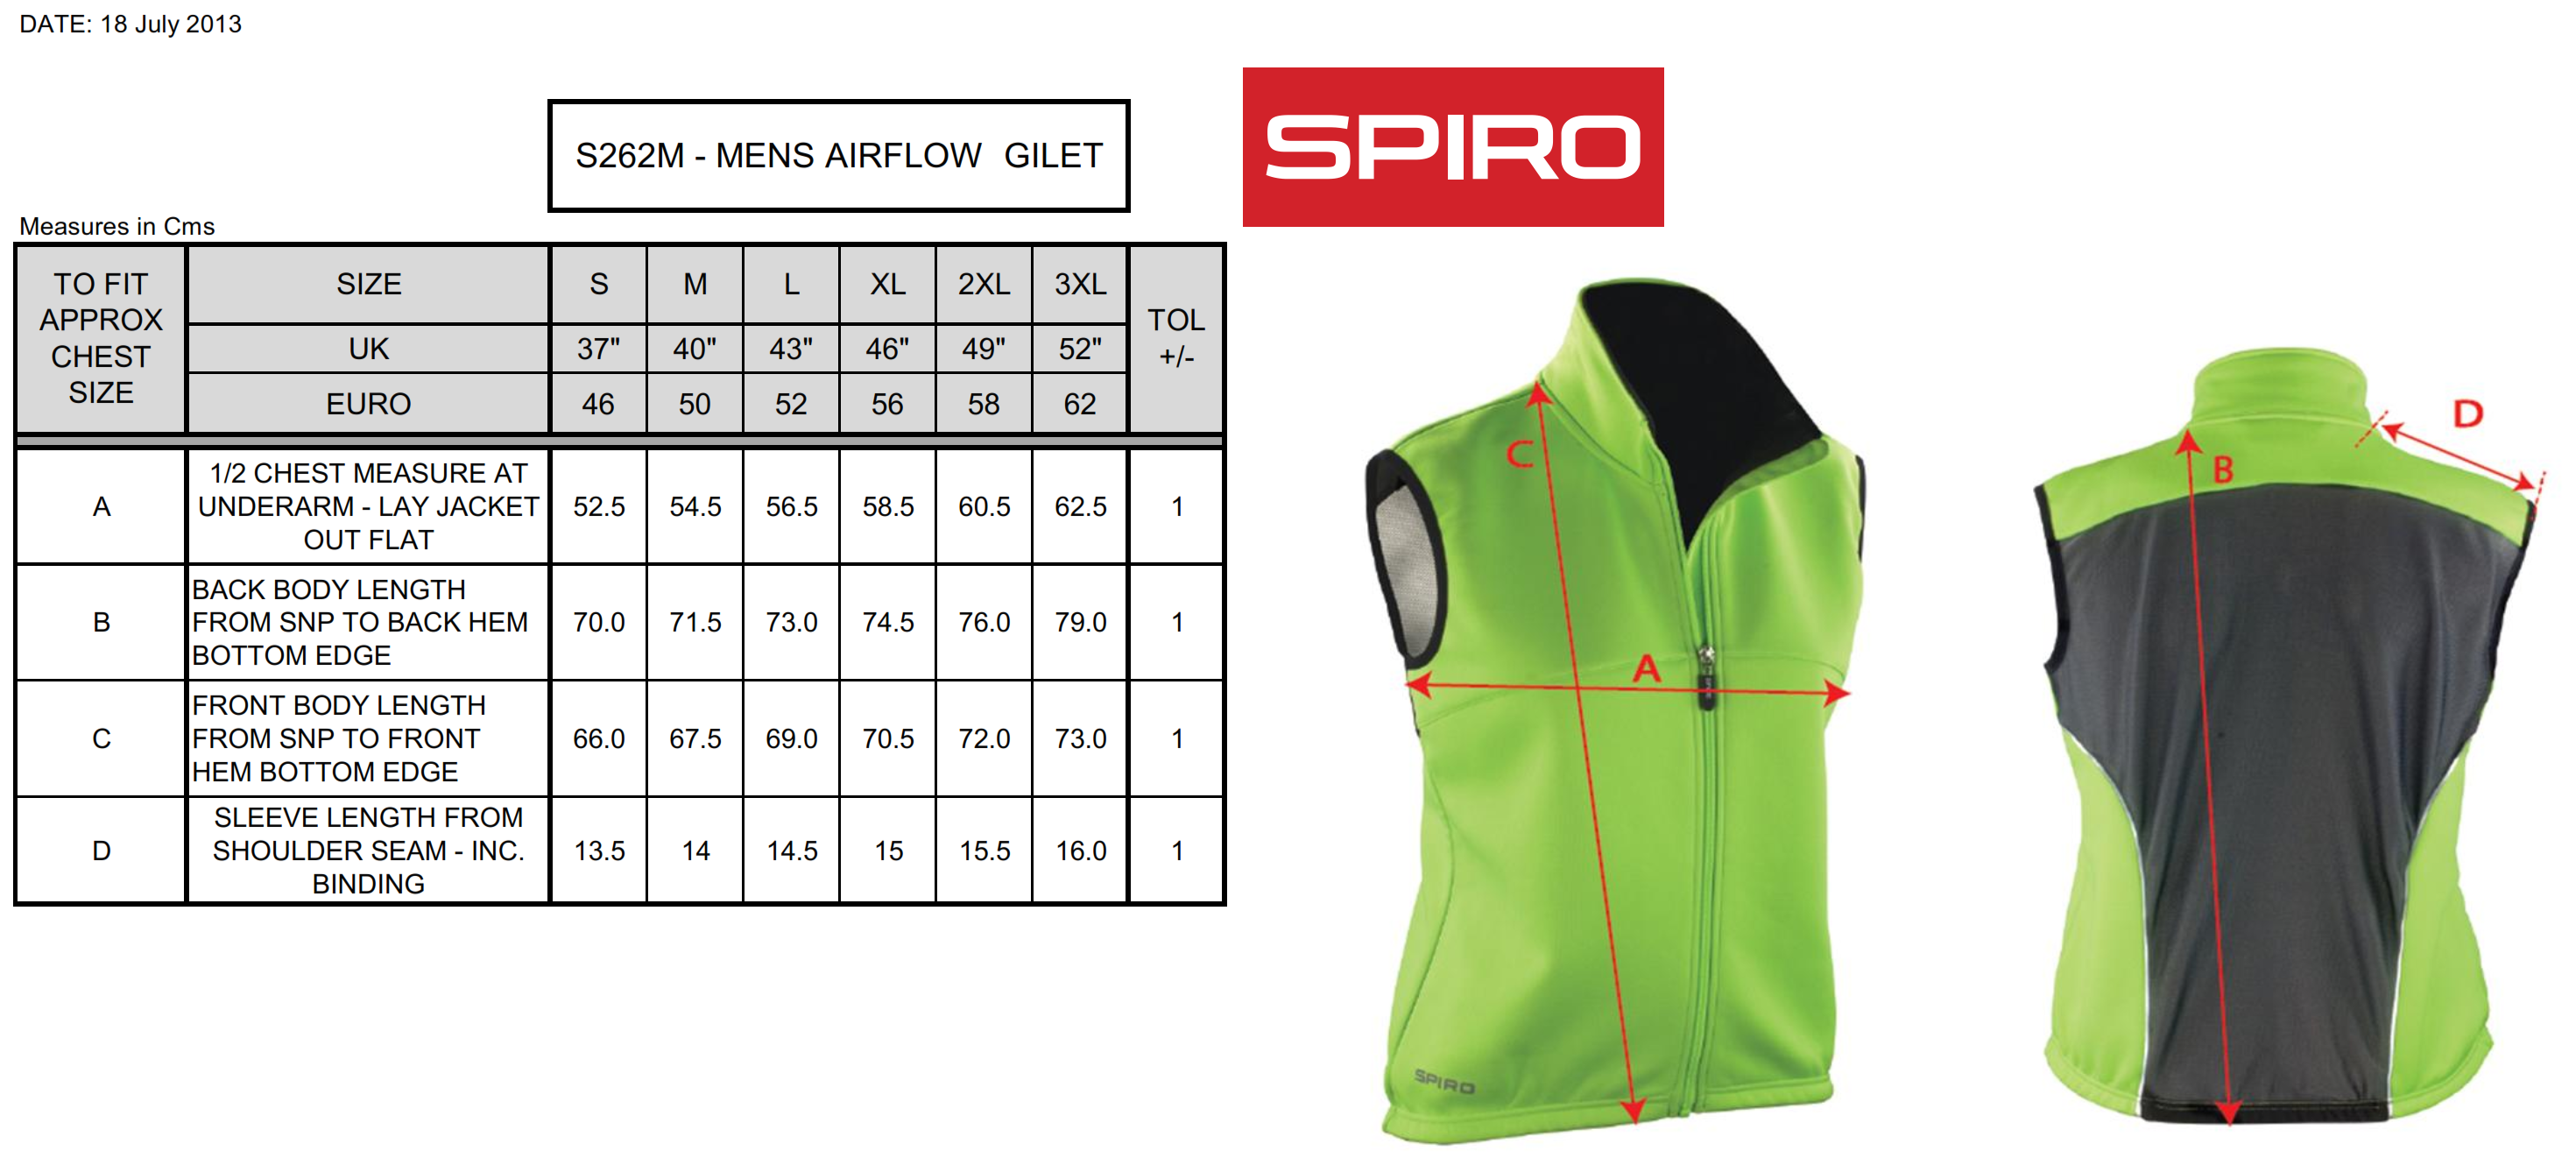 Result: Spiro Airflow Gilet S262M